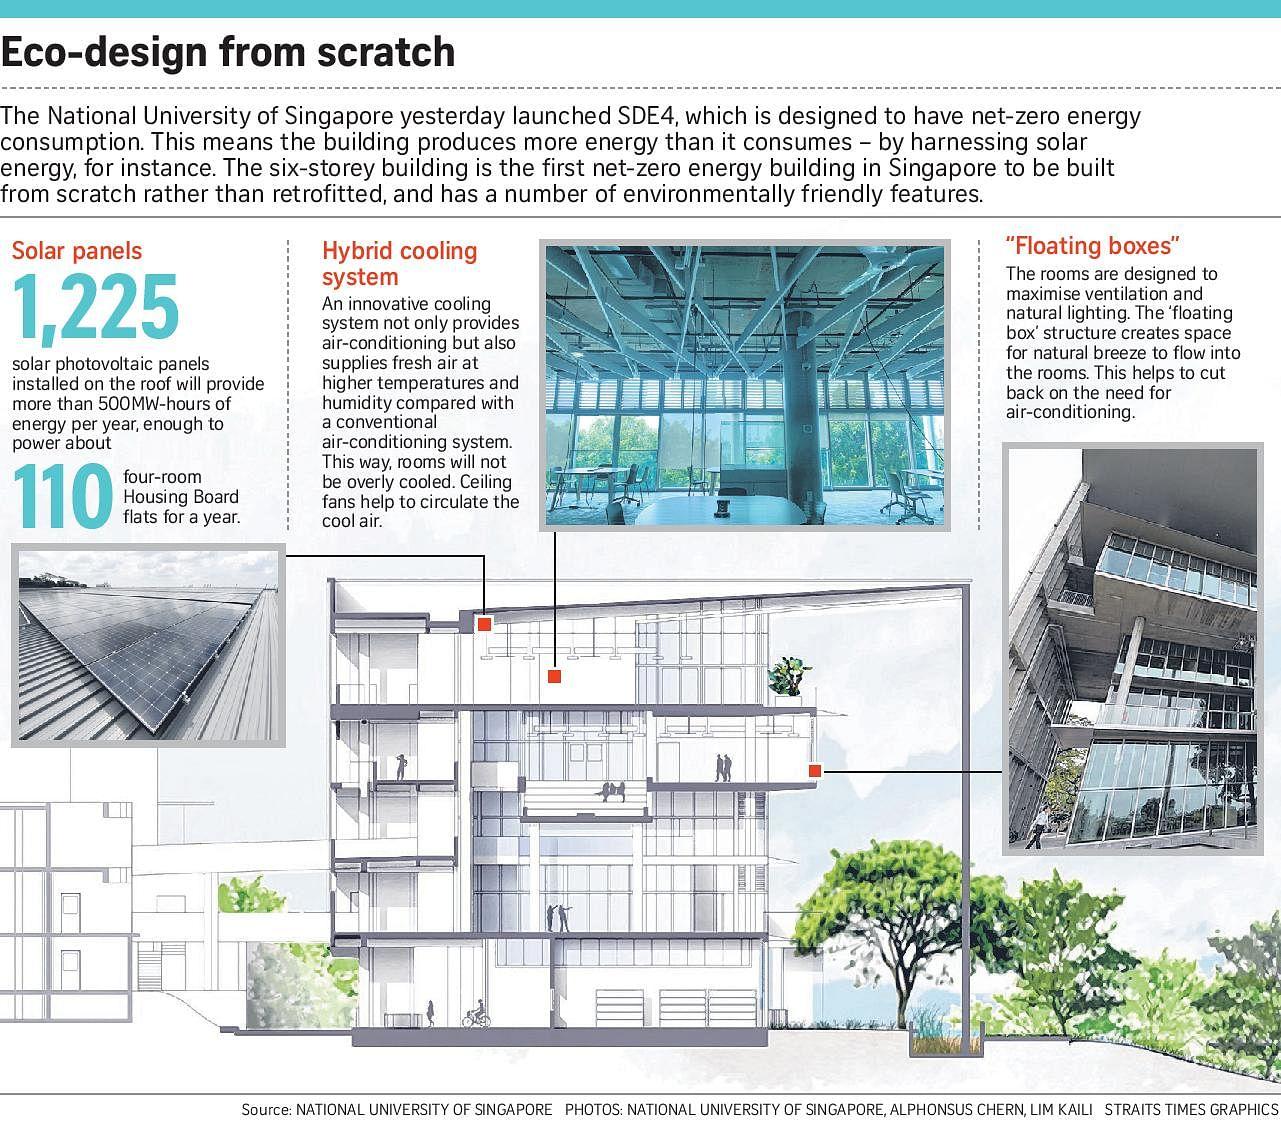 NUS launches net-zero energy building, Environment News & Top